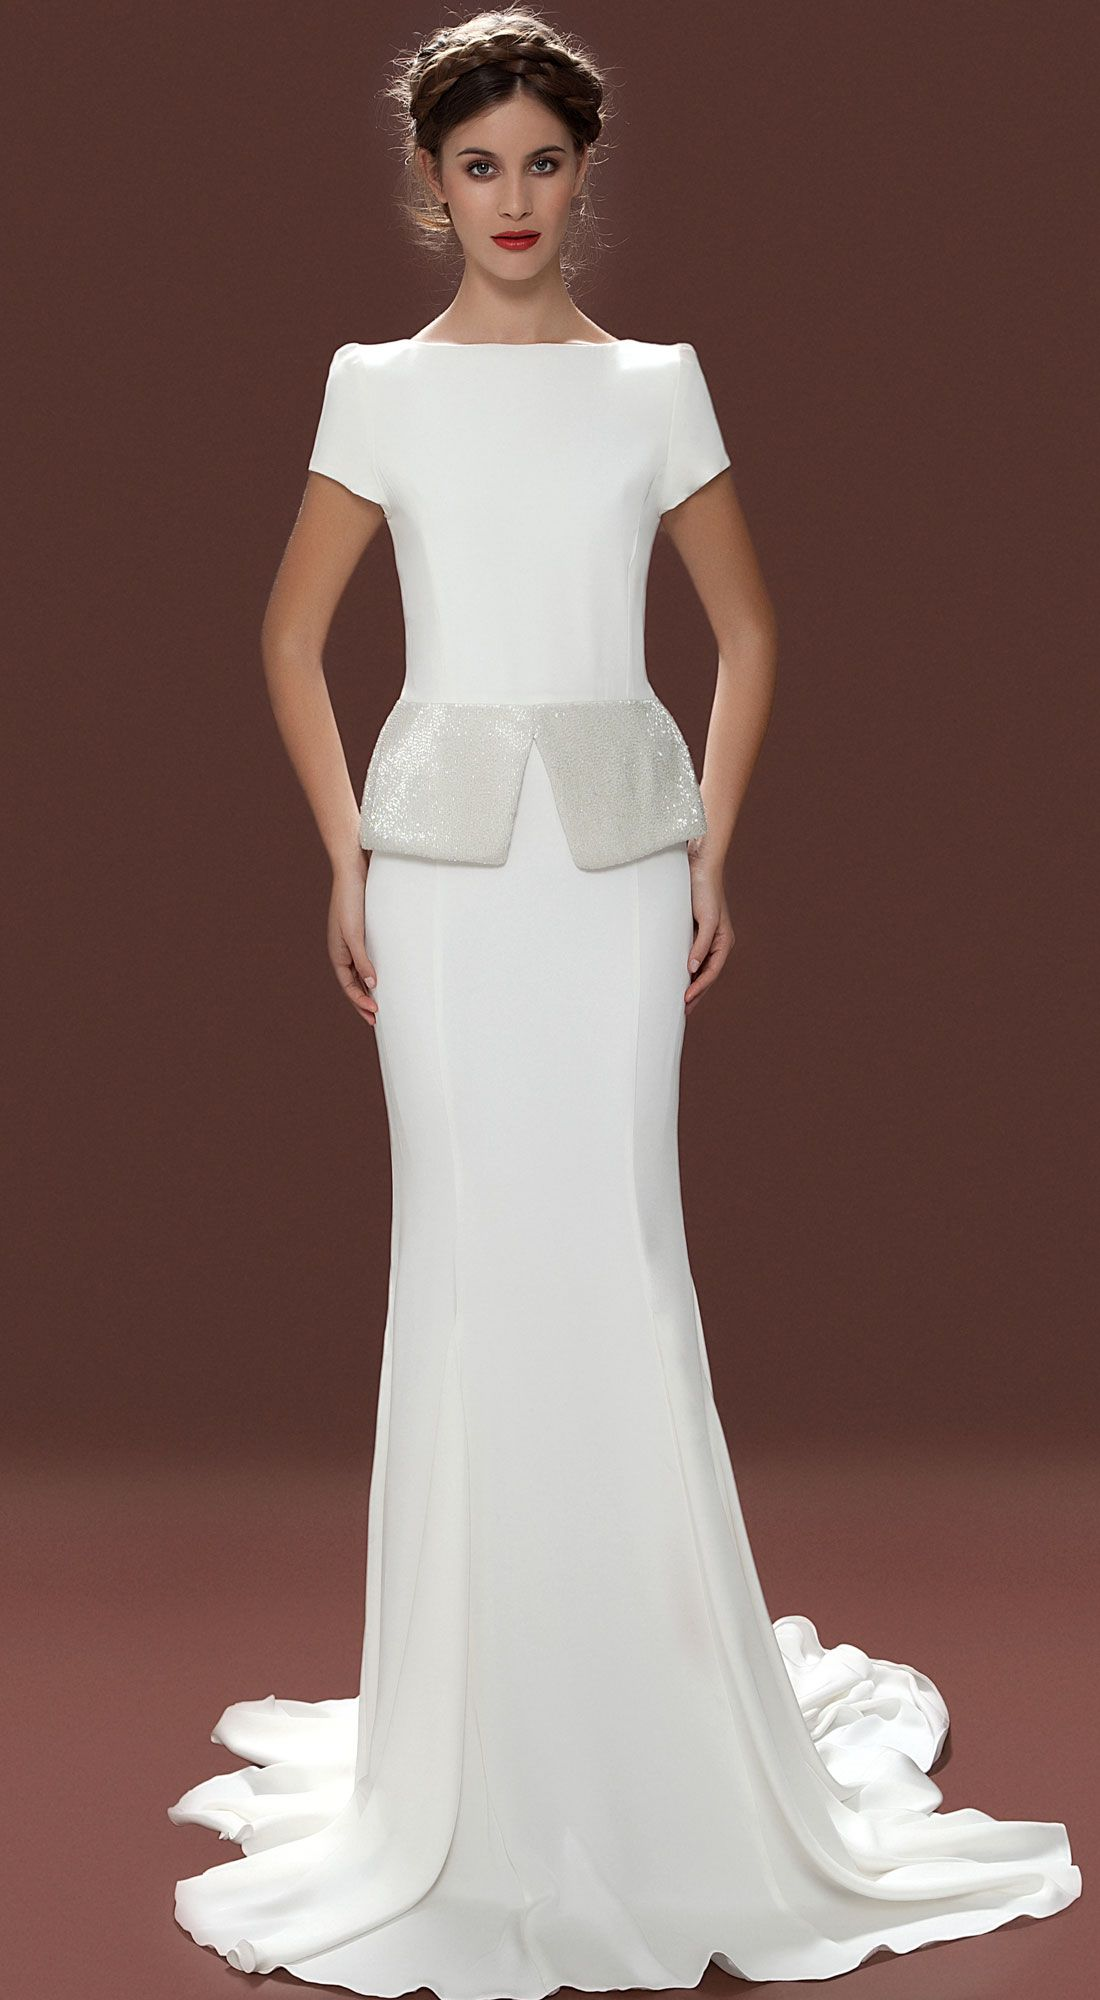 Fabulous Lara Hannah Elizabeth Dress The fashion forward yet modest Elizabeth wedding dress features an embellished peplum